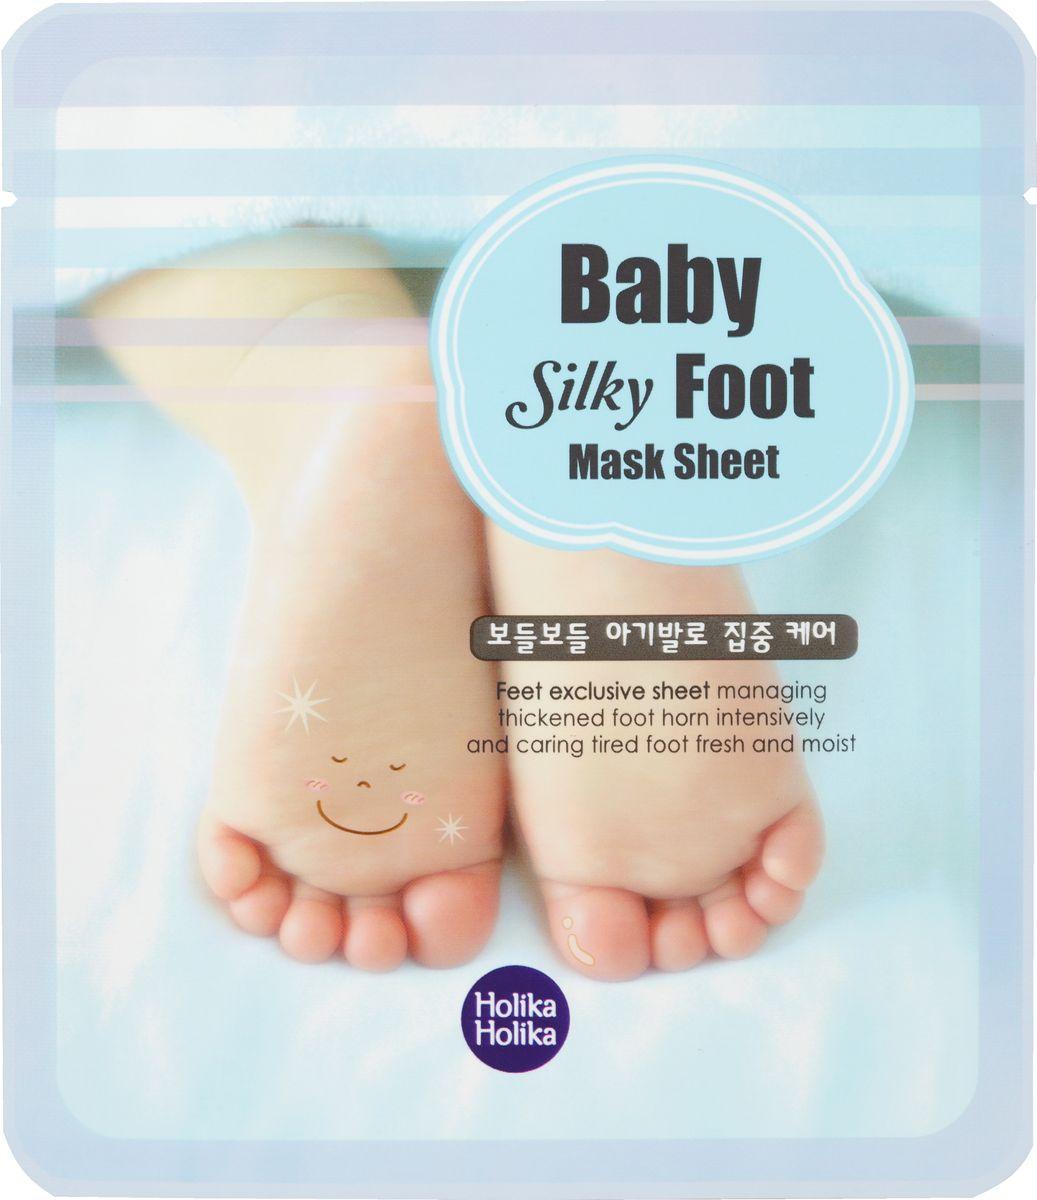 Holika Holika Смягчающая маска для ног Бэйби Силки, 18мл+18мл20017601